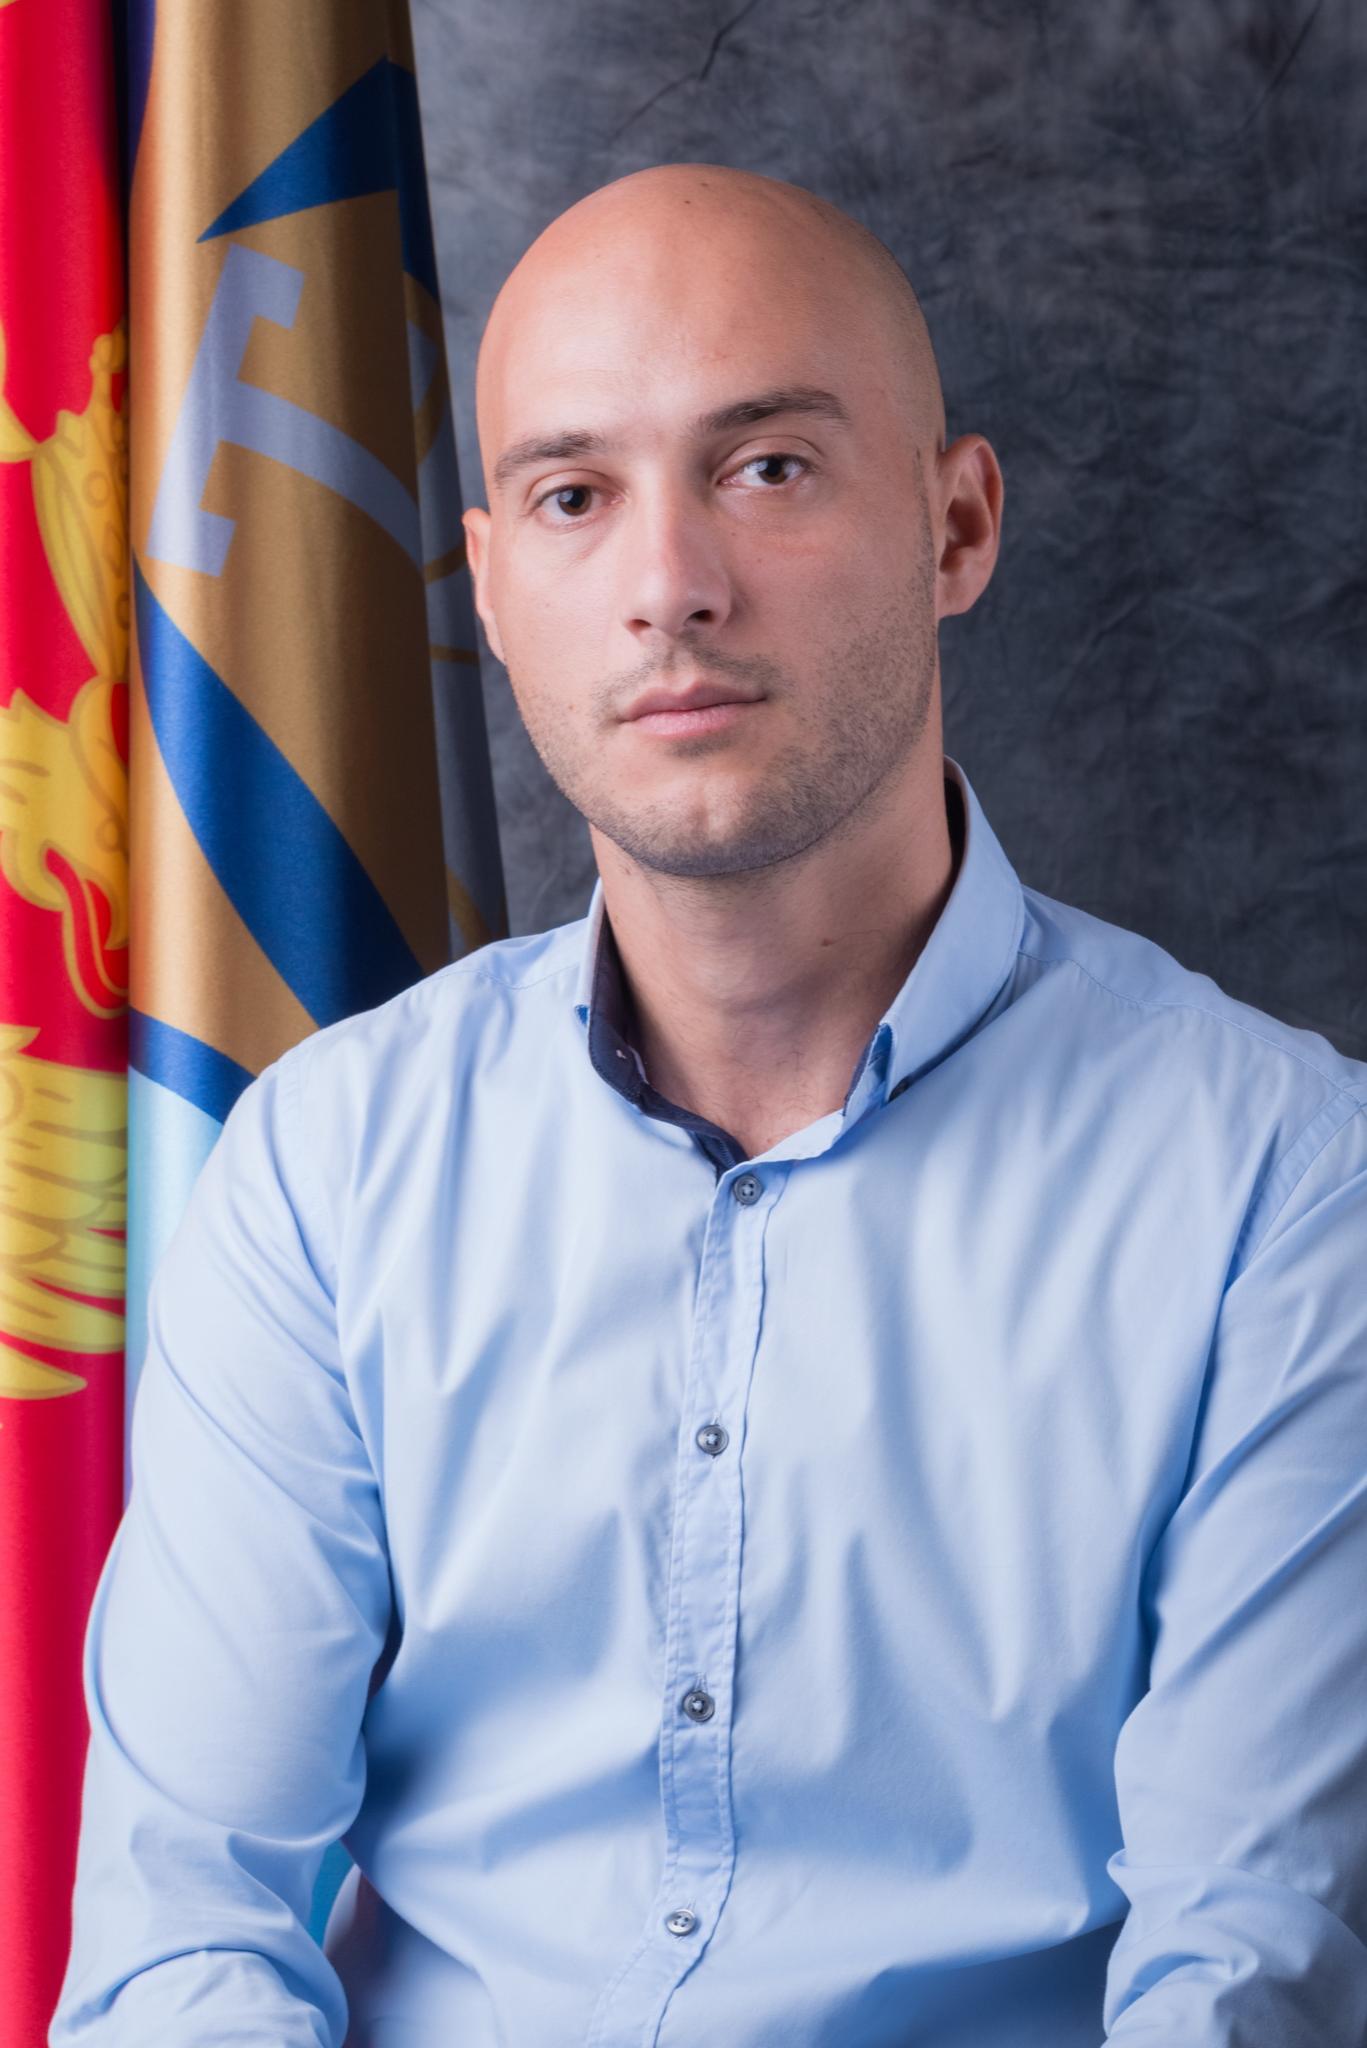 Secretary of the Assembly slika profil